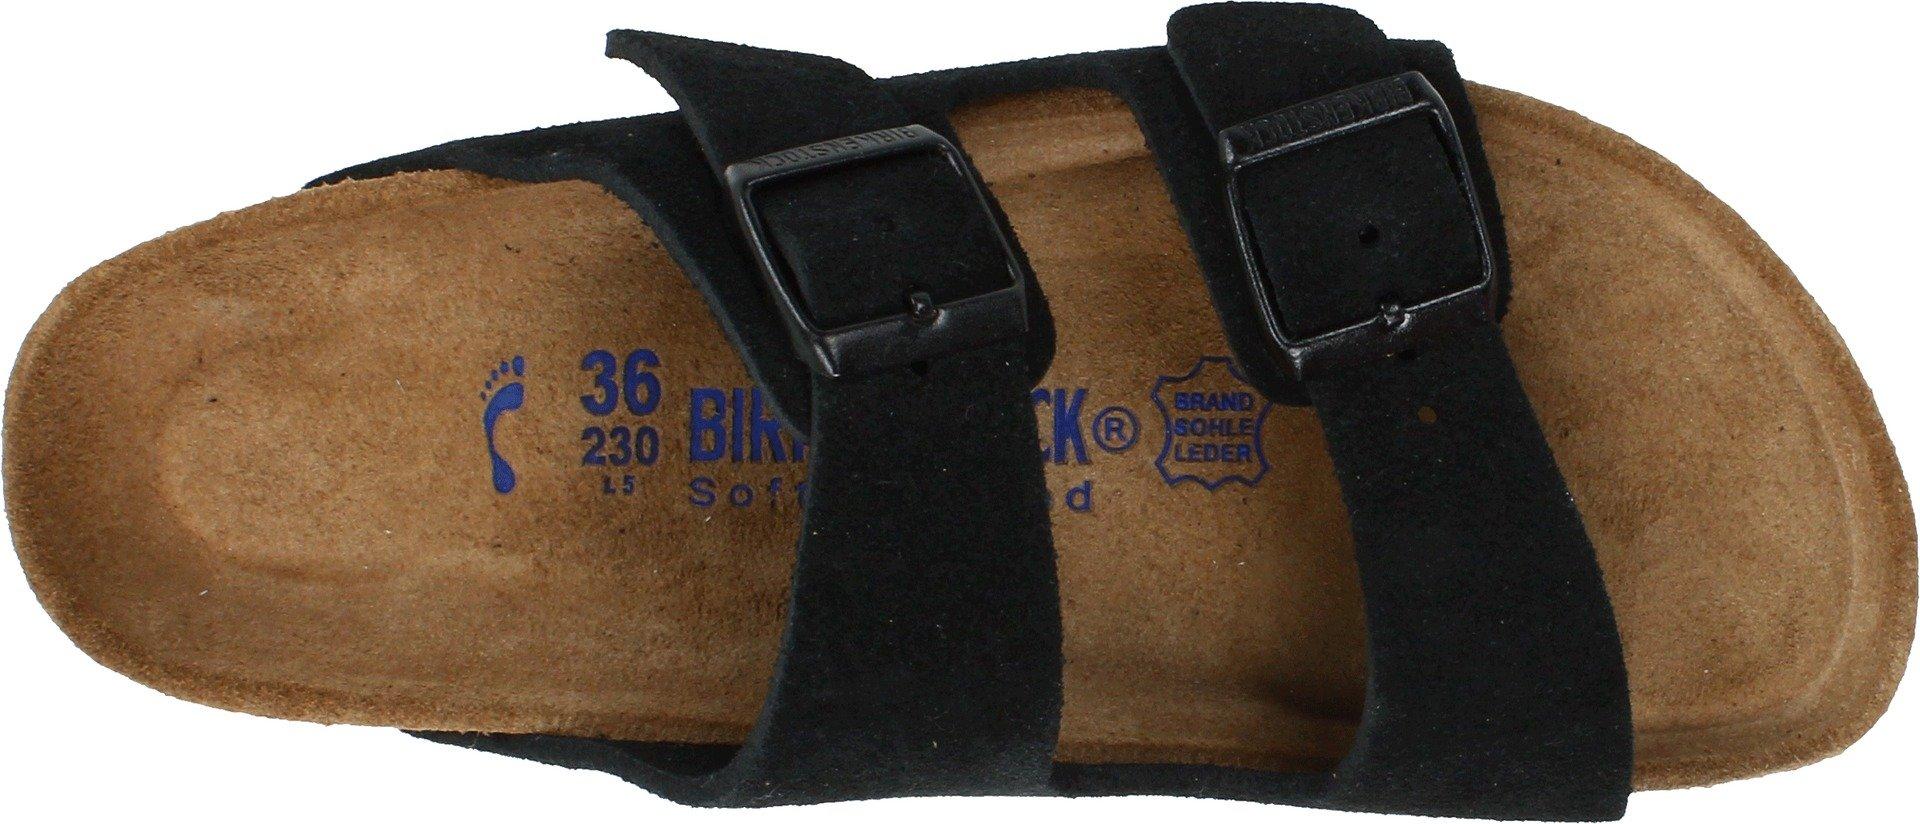 Birkenstock Arizona Soft Footbed Black Suede Regular Width - EU Size 35 / Women's US Sizes 4-4.5 by Birkenstock (Image #7)